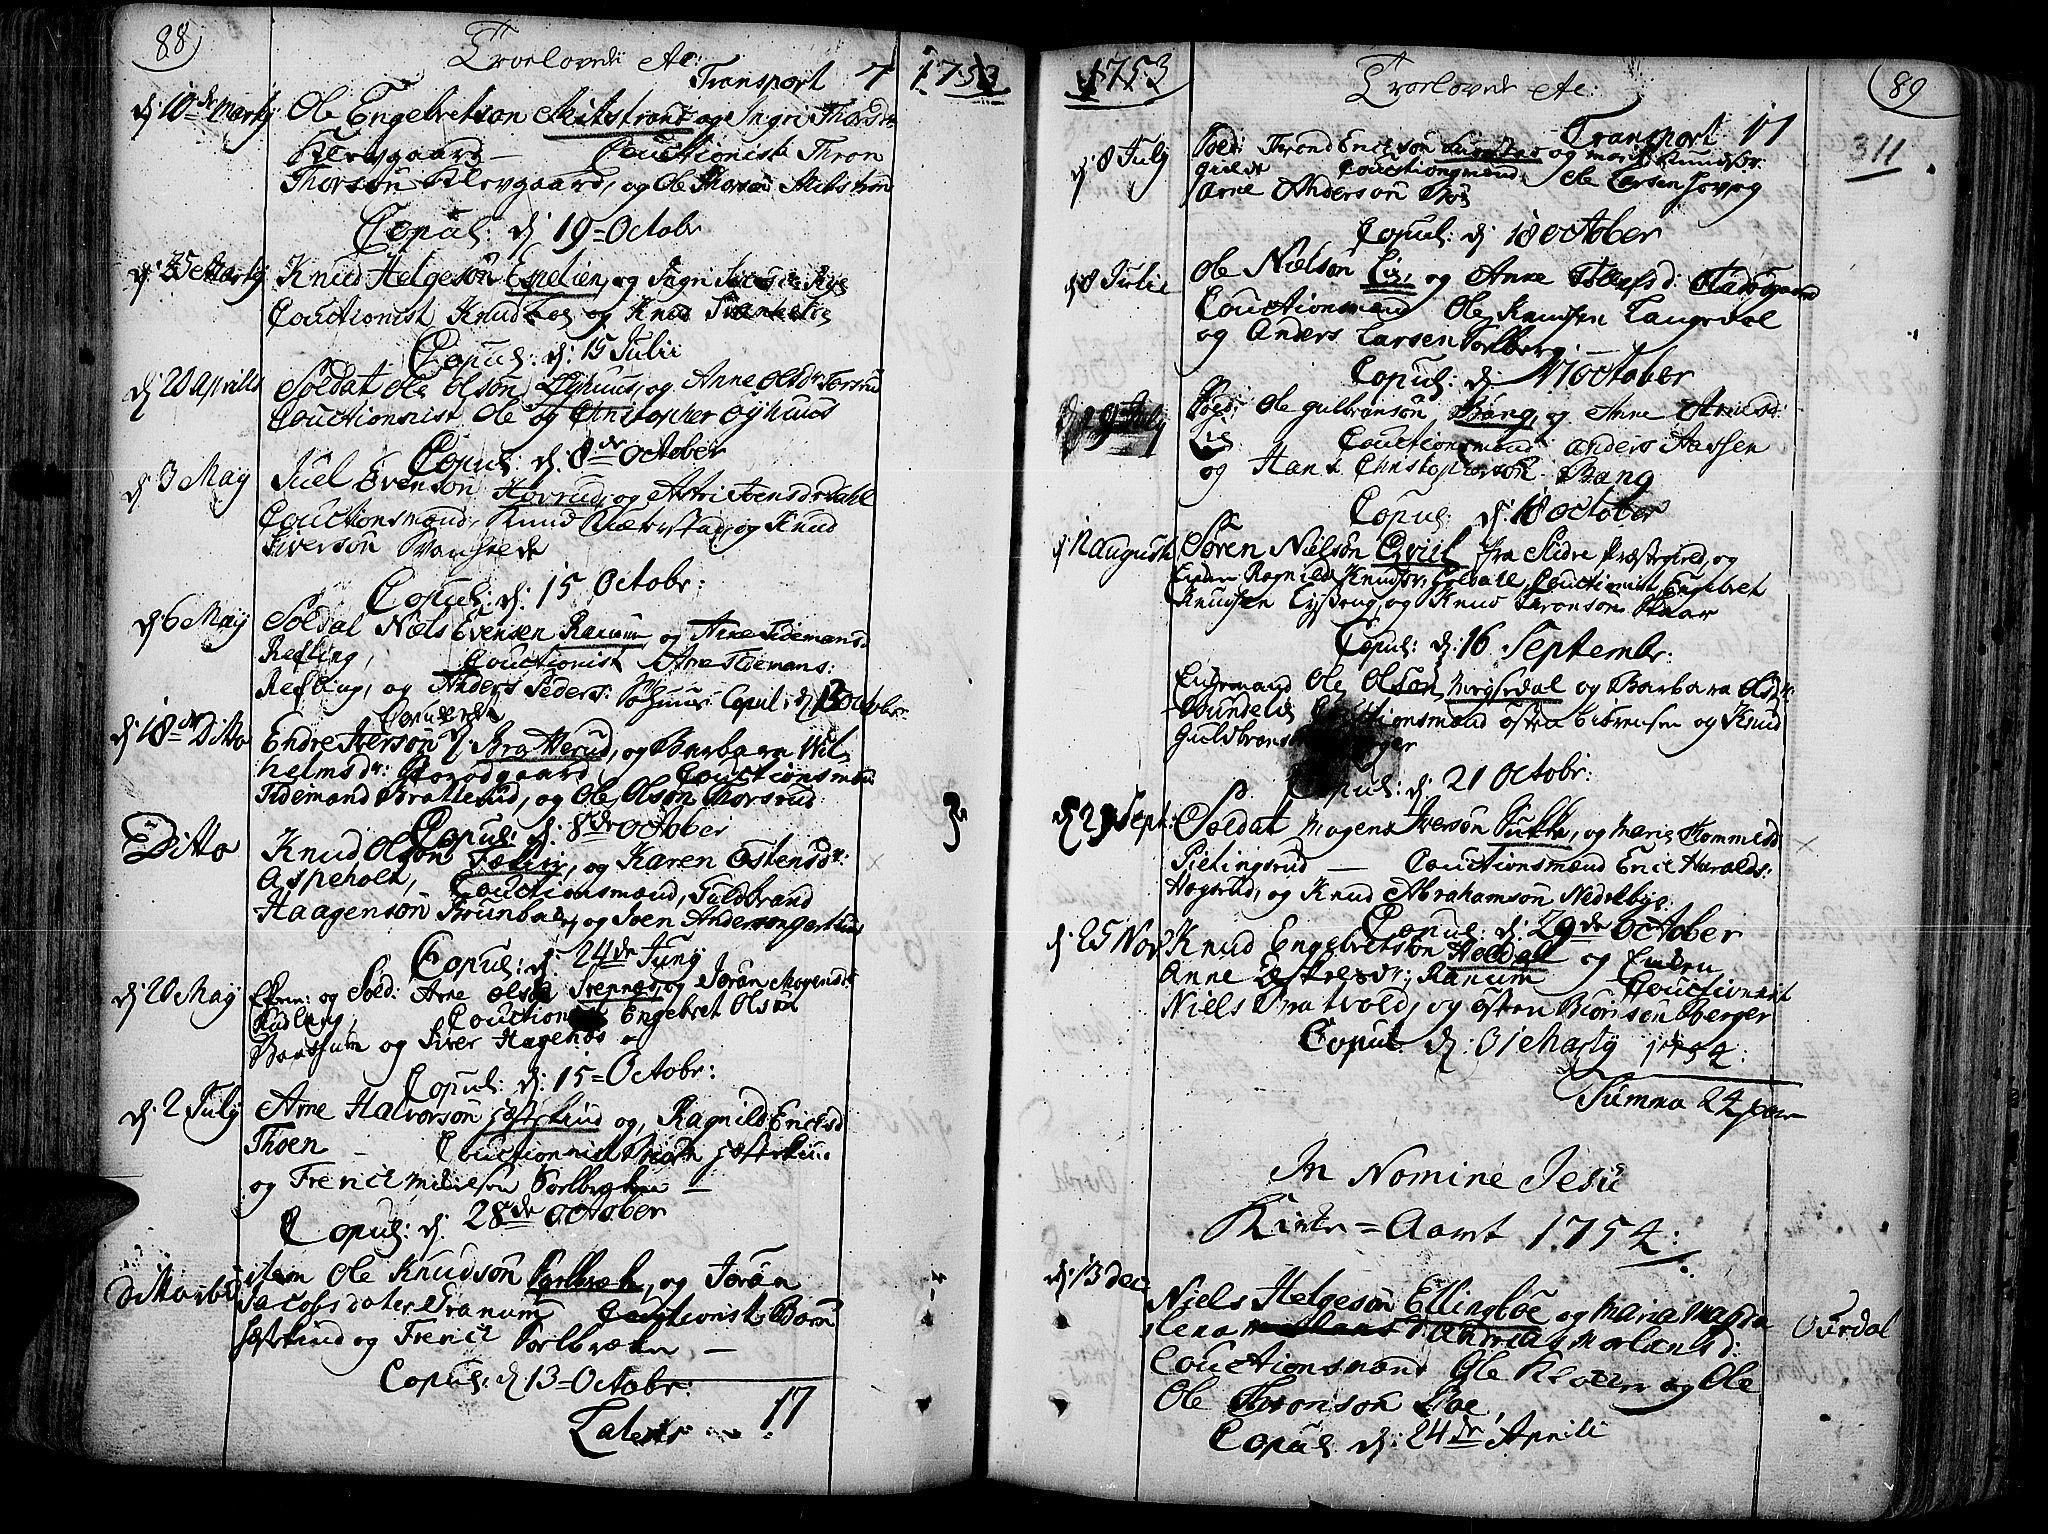 SAH, Aurdal prestekontor, Ministerialbok nr. 4, 1730-1762, s. 88-89